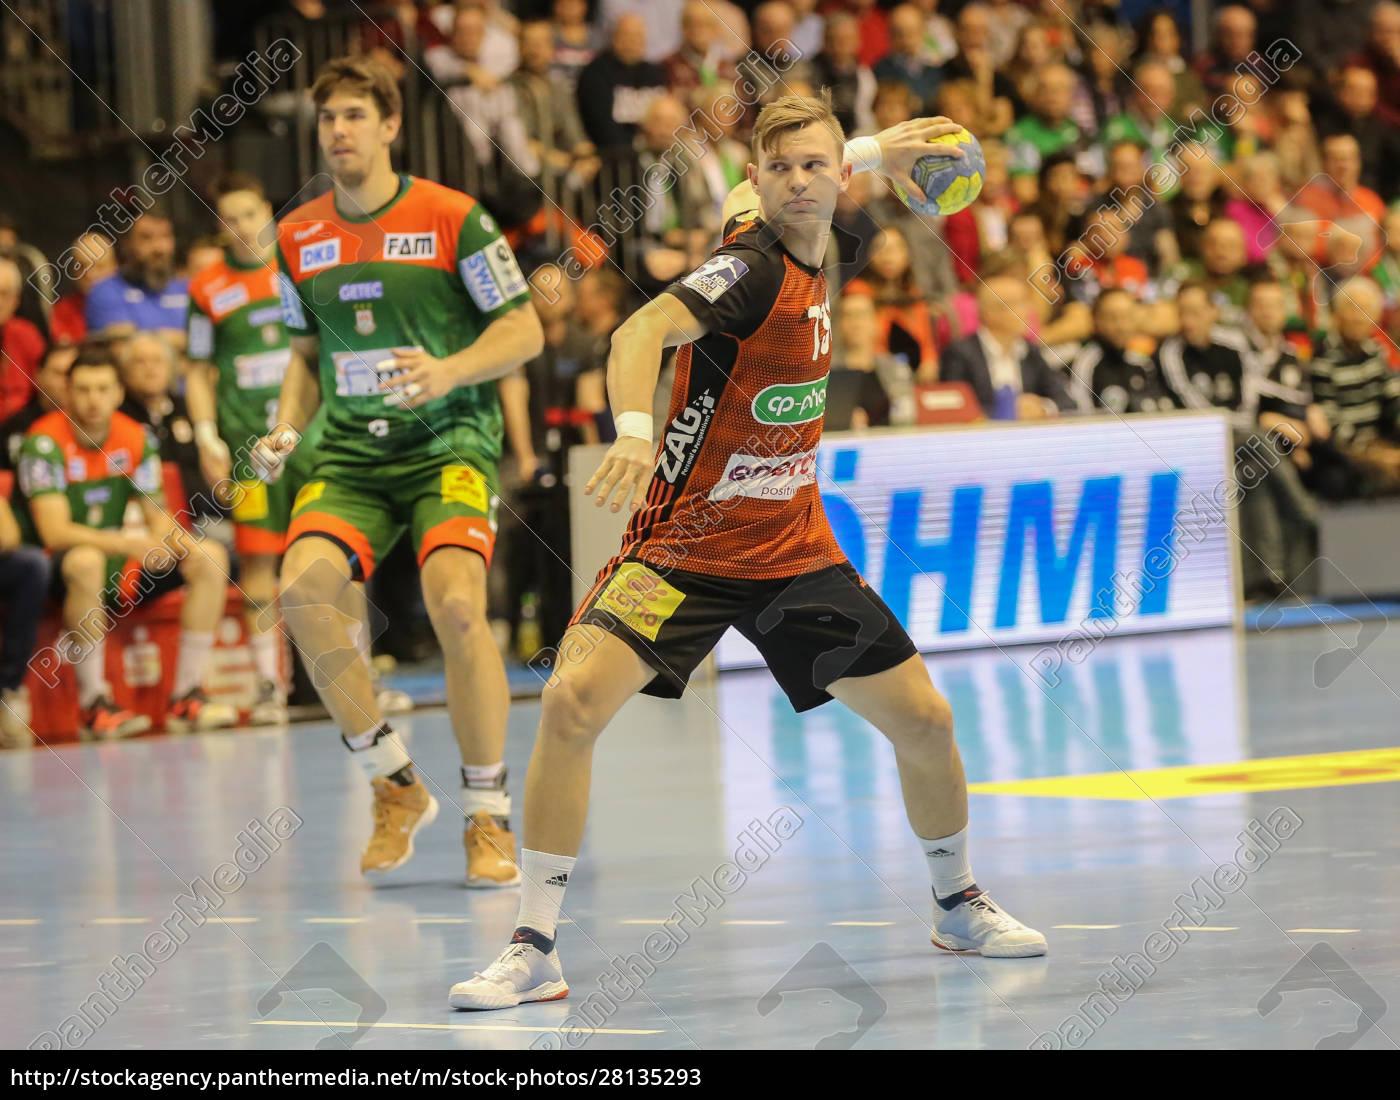 niemiecki, piłkarz, ręczny, timo, kastening, tsv, hannover-burgdorf - 28135293